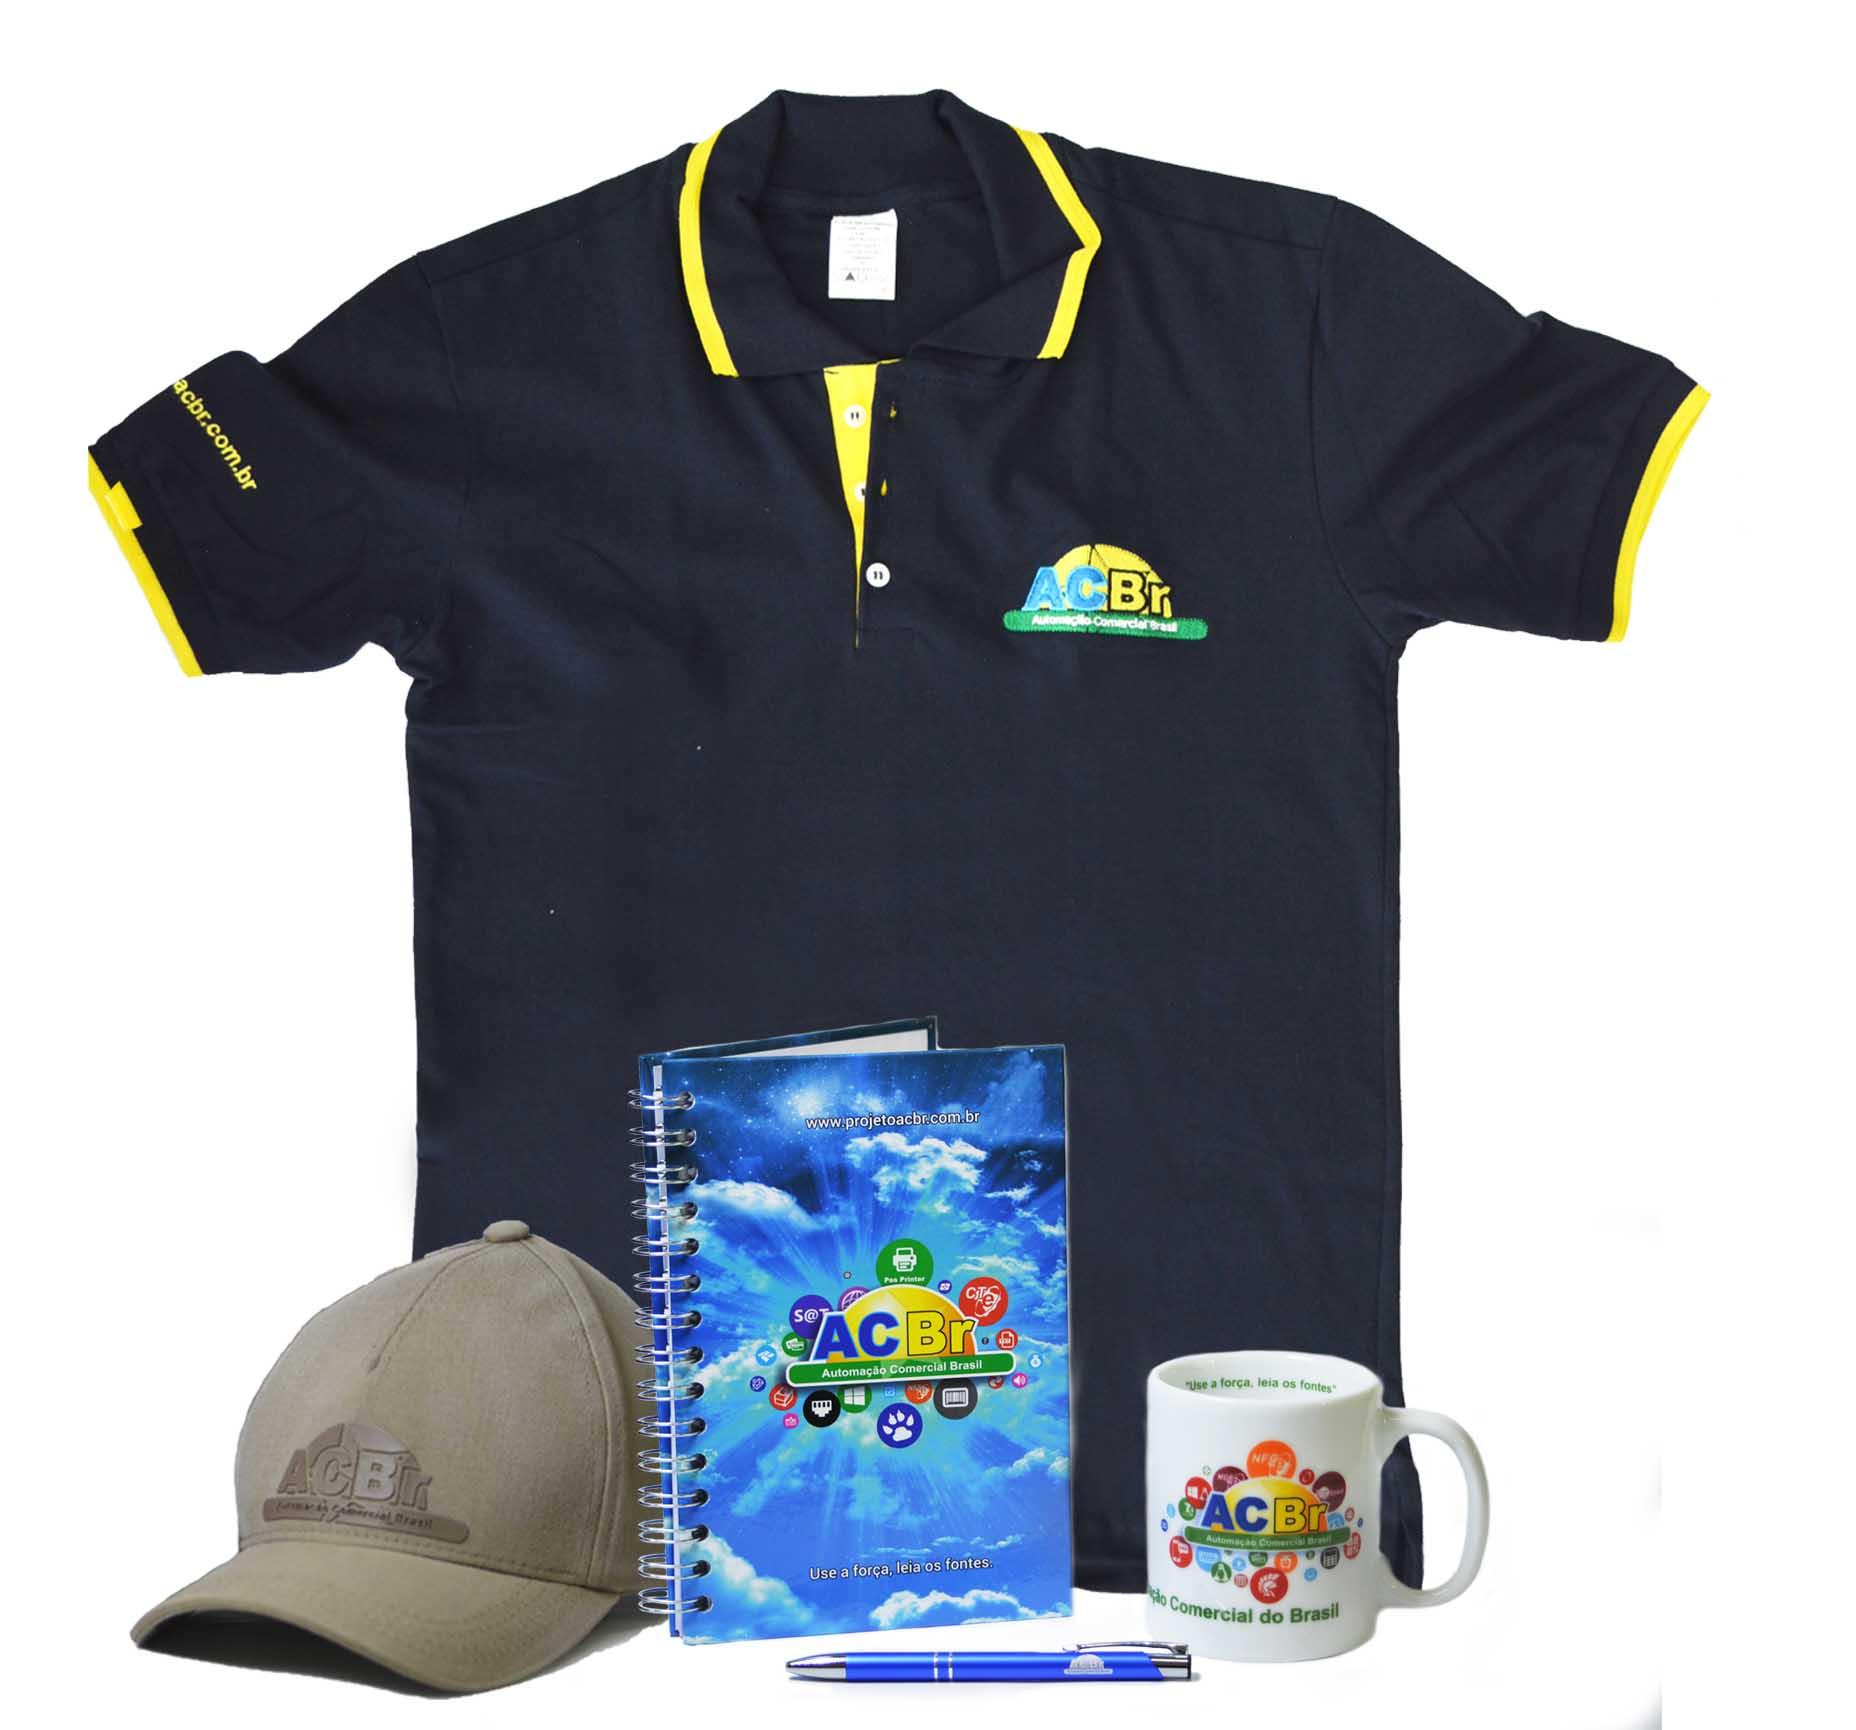 Kit Completo ACBr